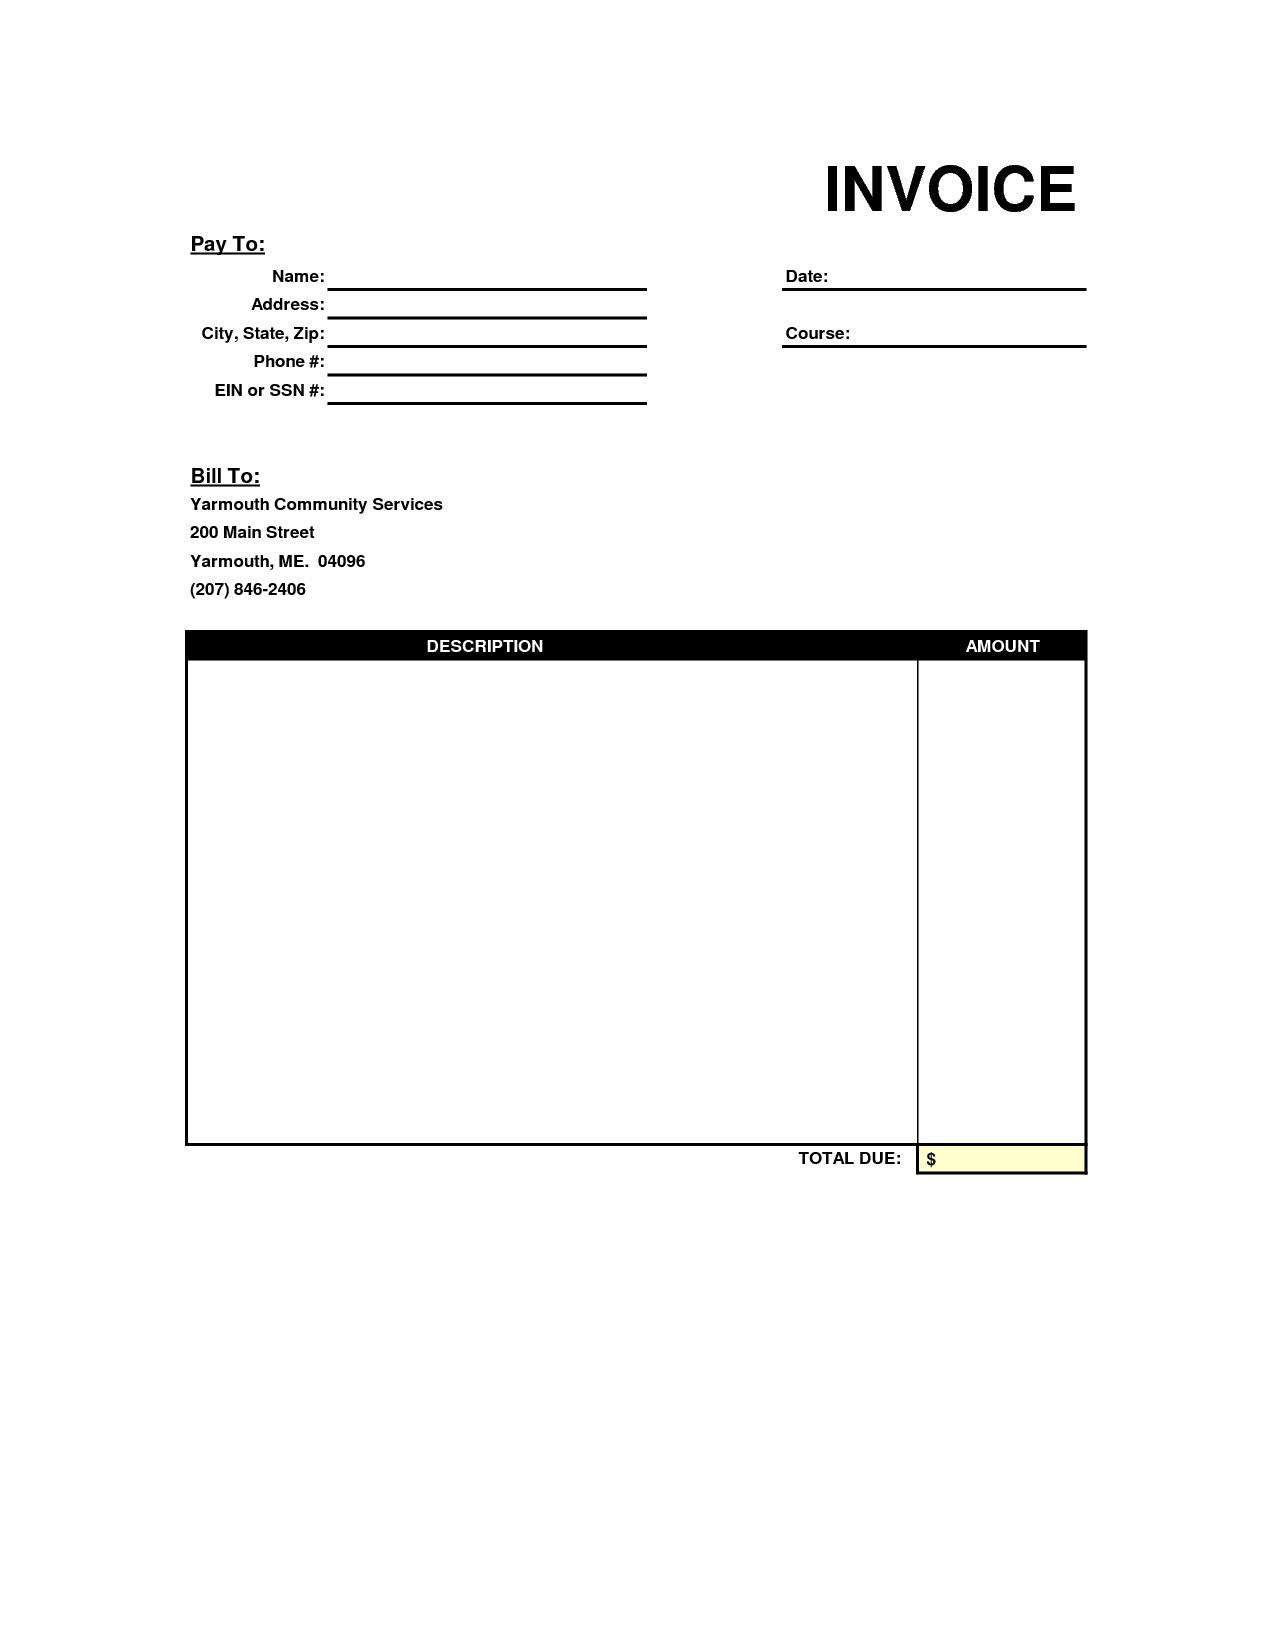 Simple Invoice Template Pdf | invoice example